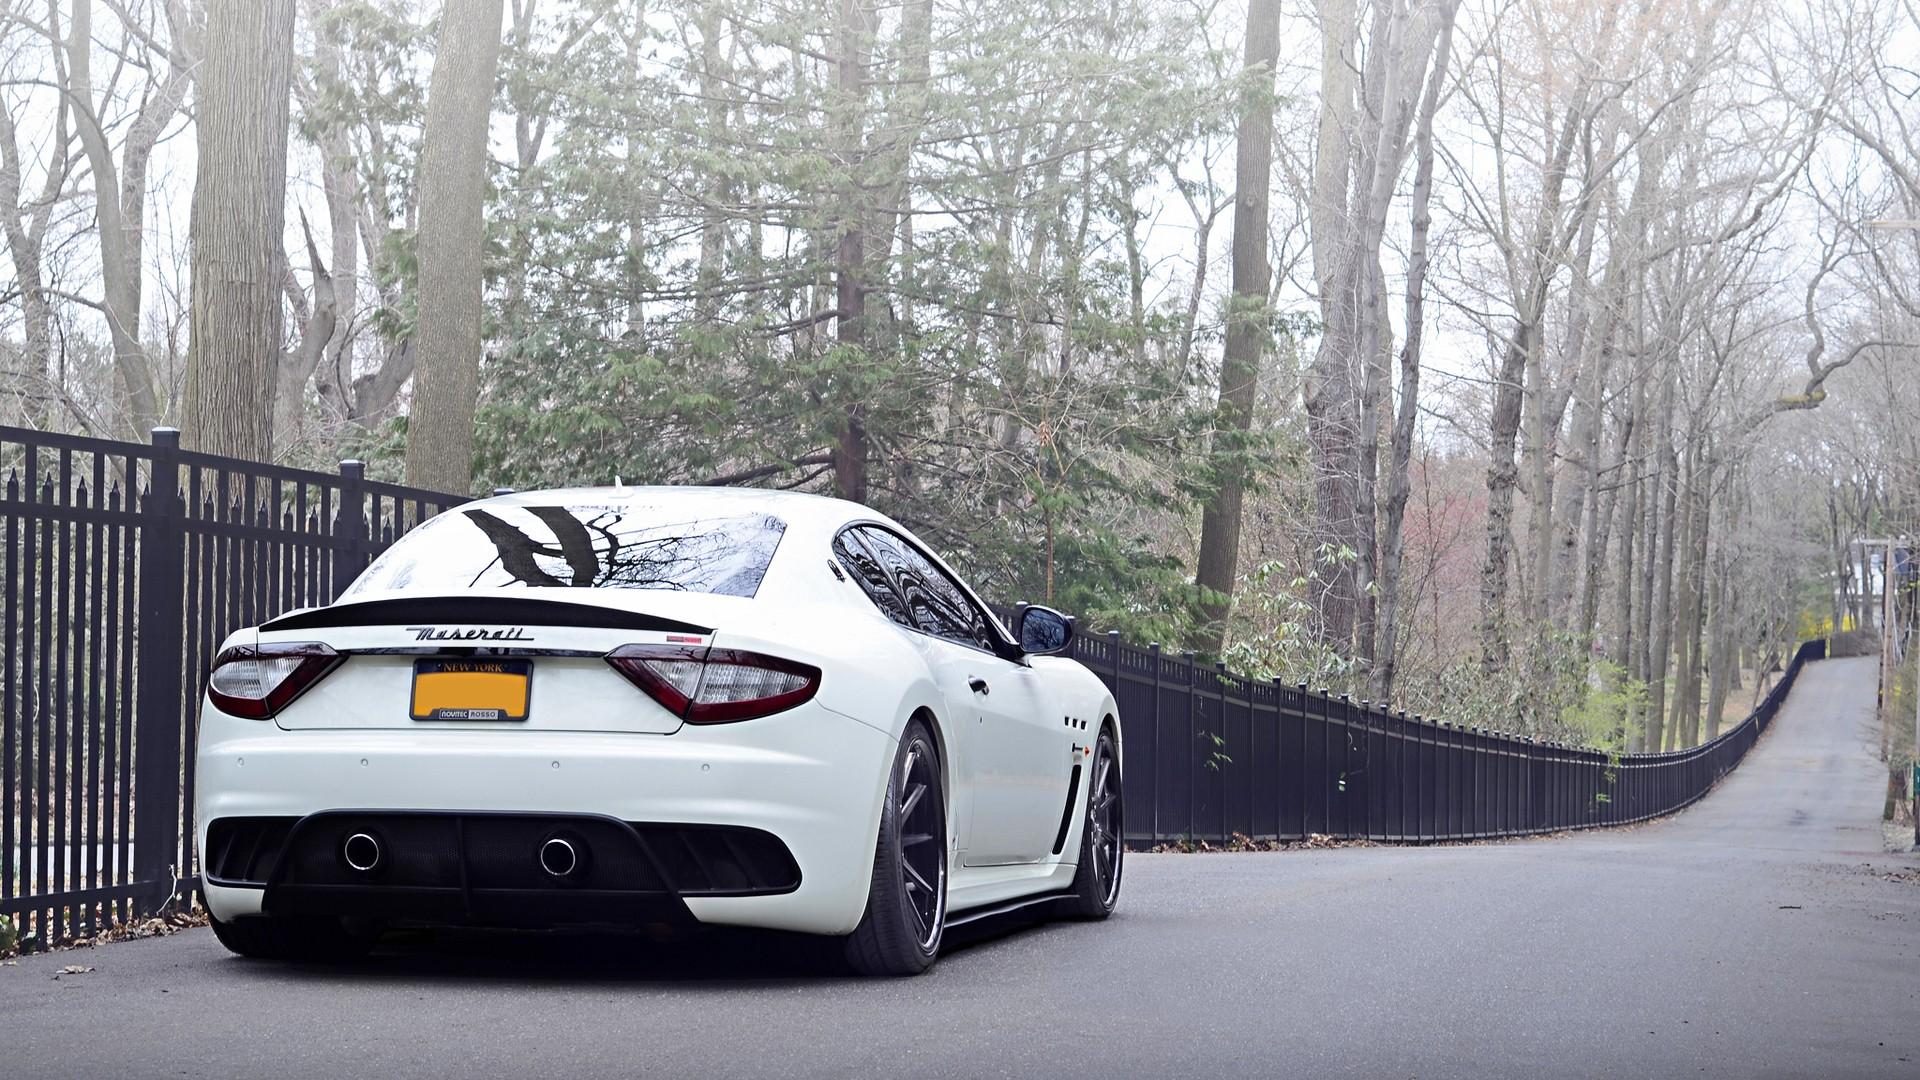 Maserati granturismo bodykit